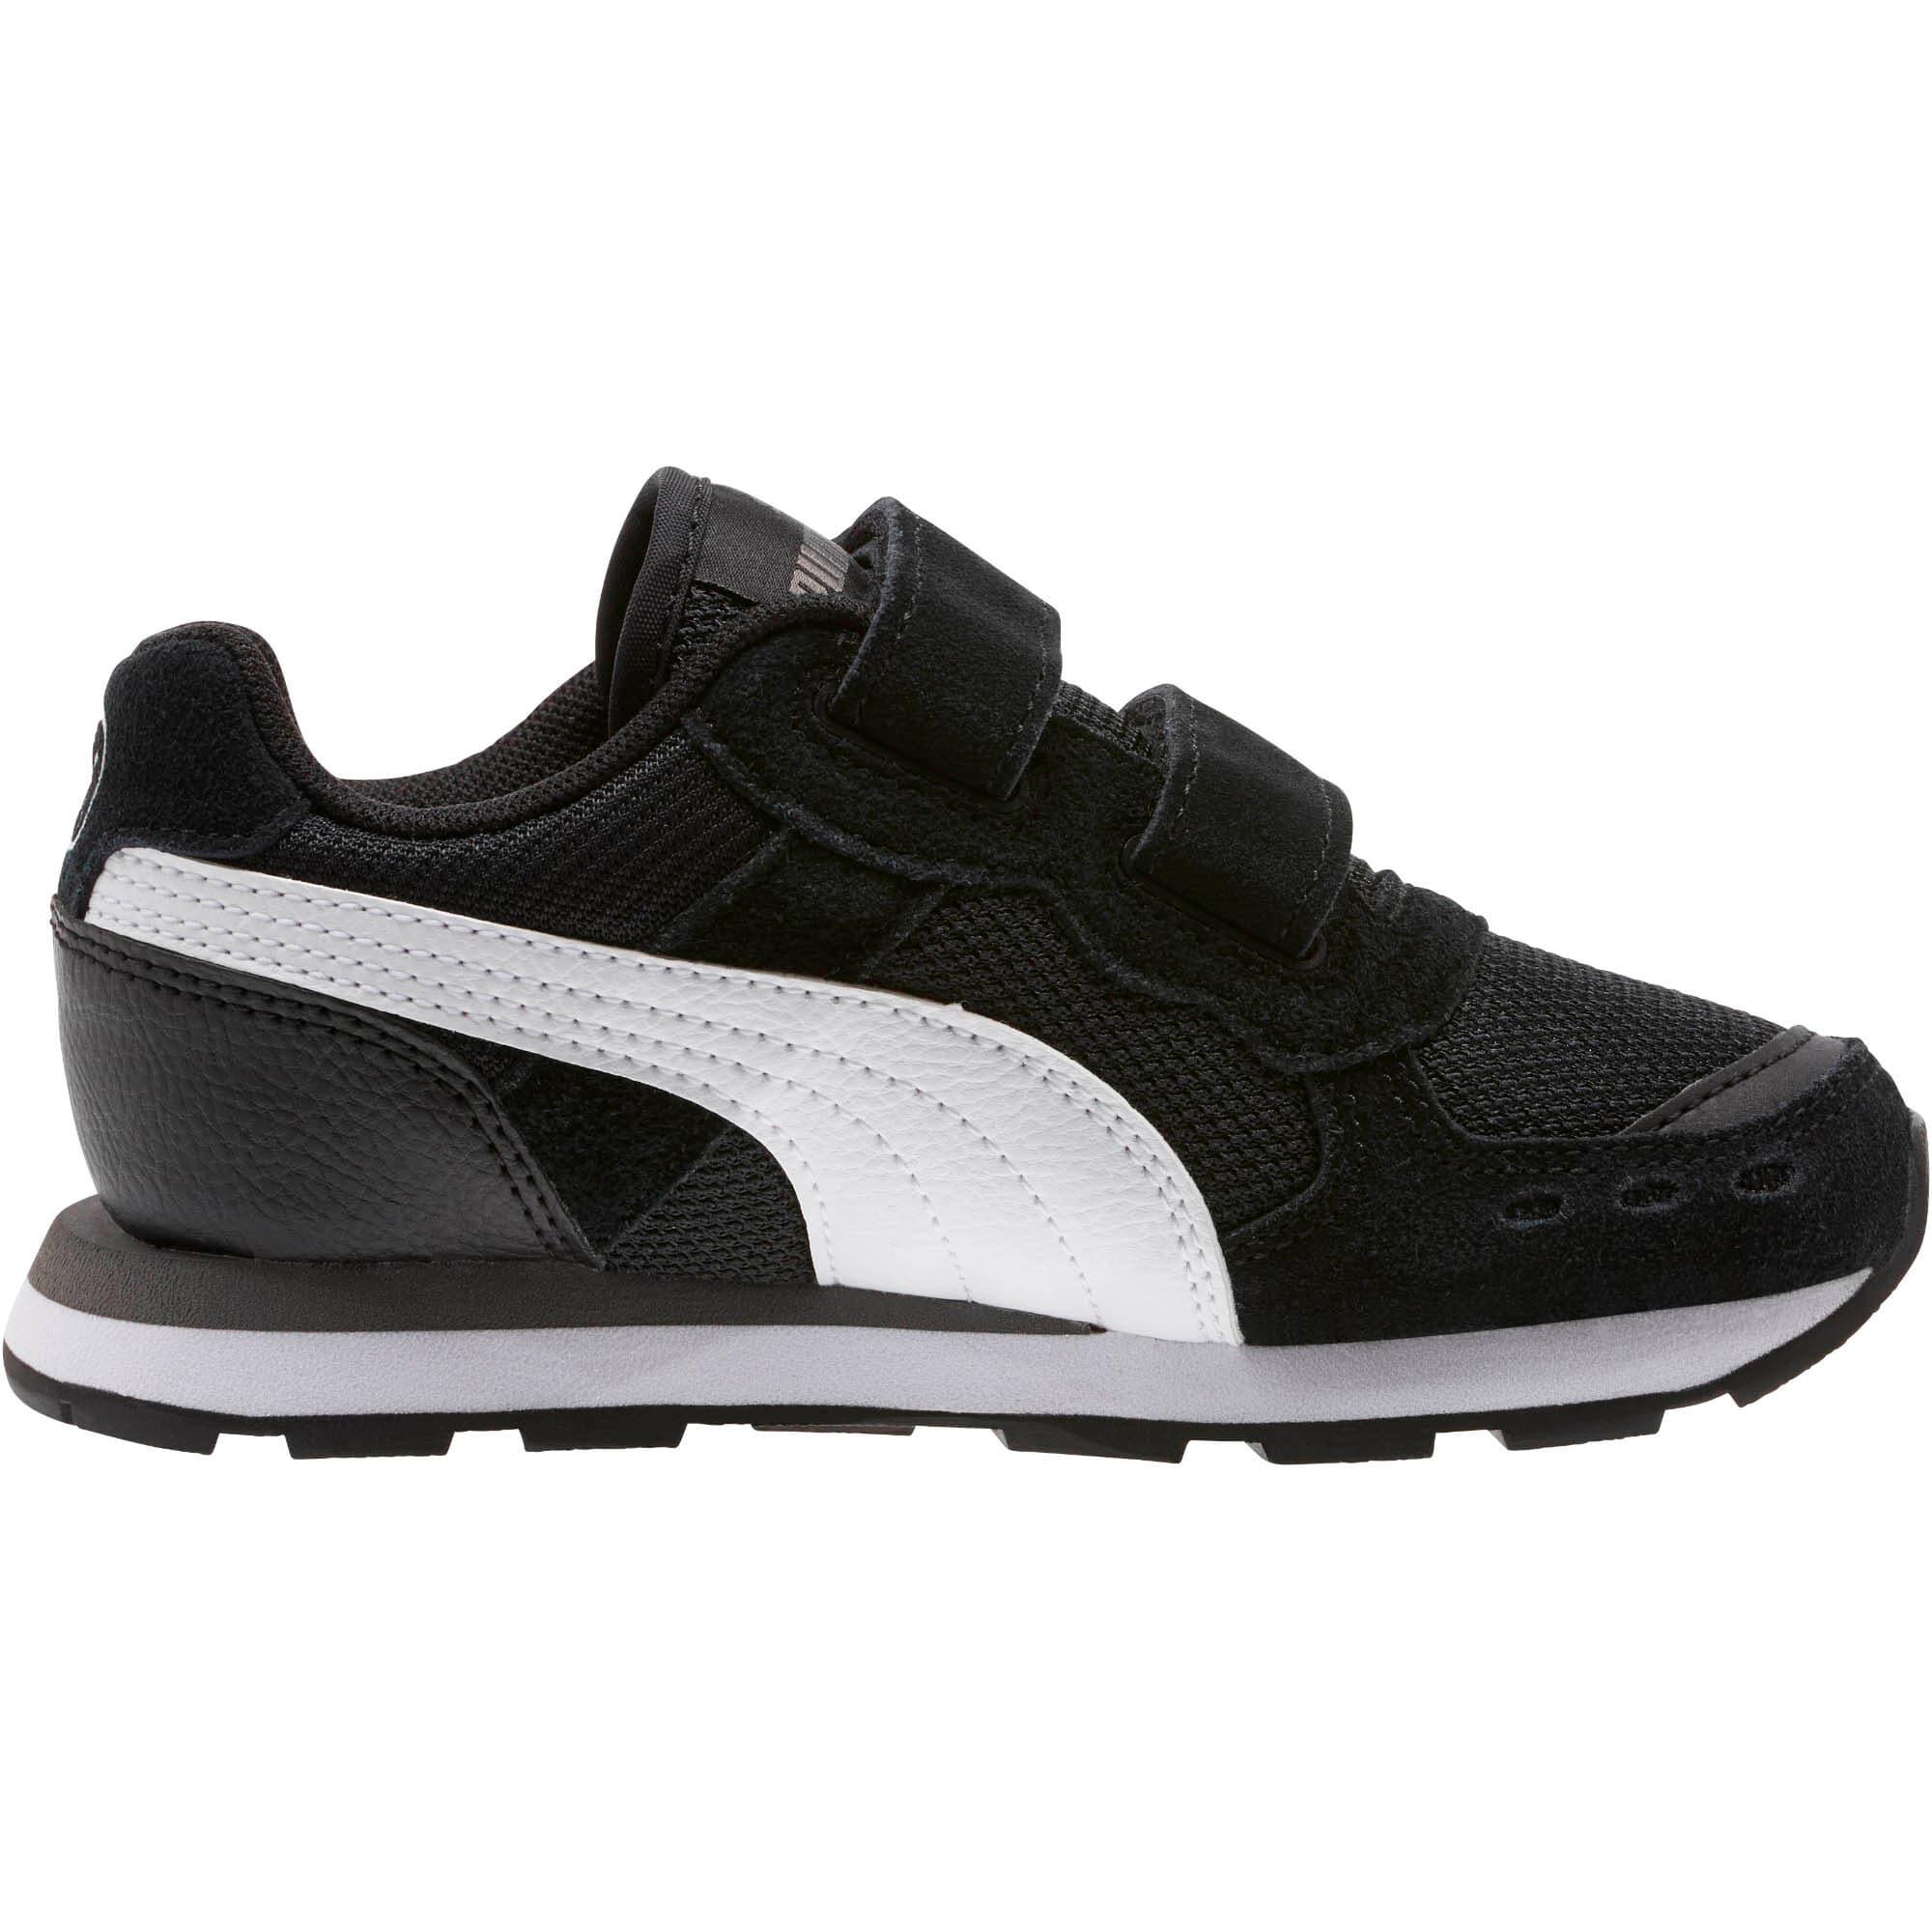 Thumbnail 3 of Vista Little Kids' Shoes, Puma Black-Puma White, medium